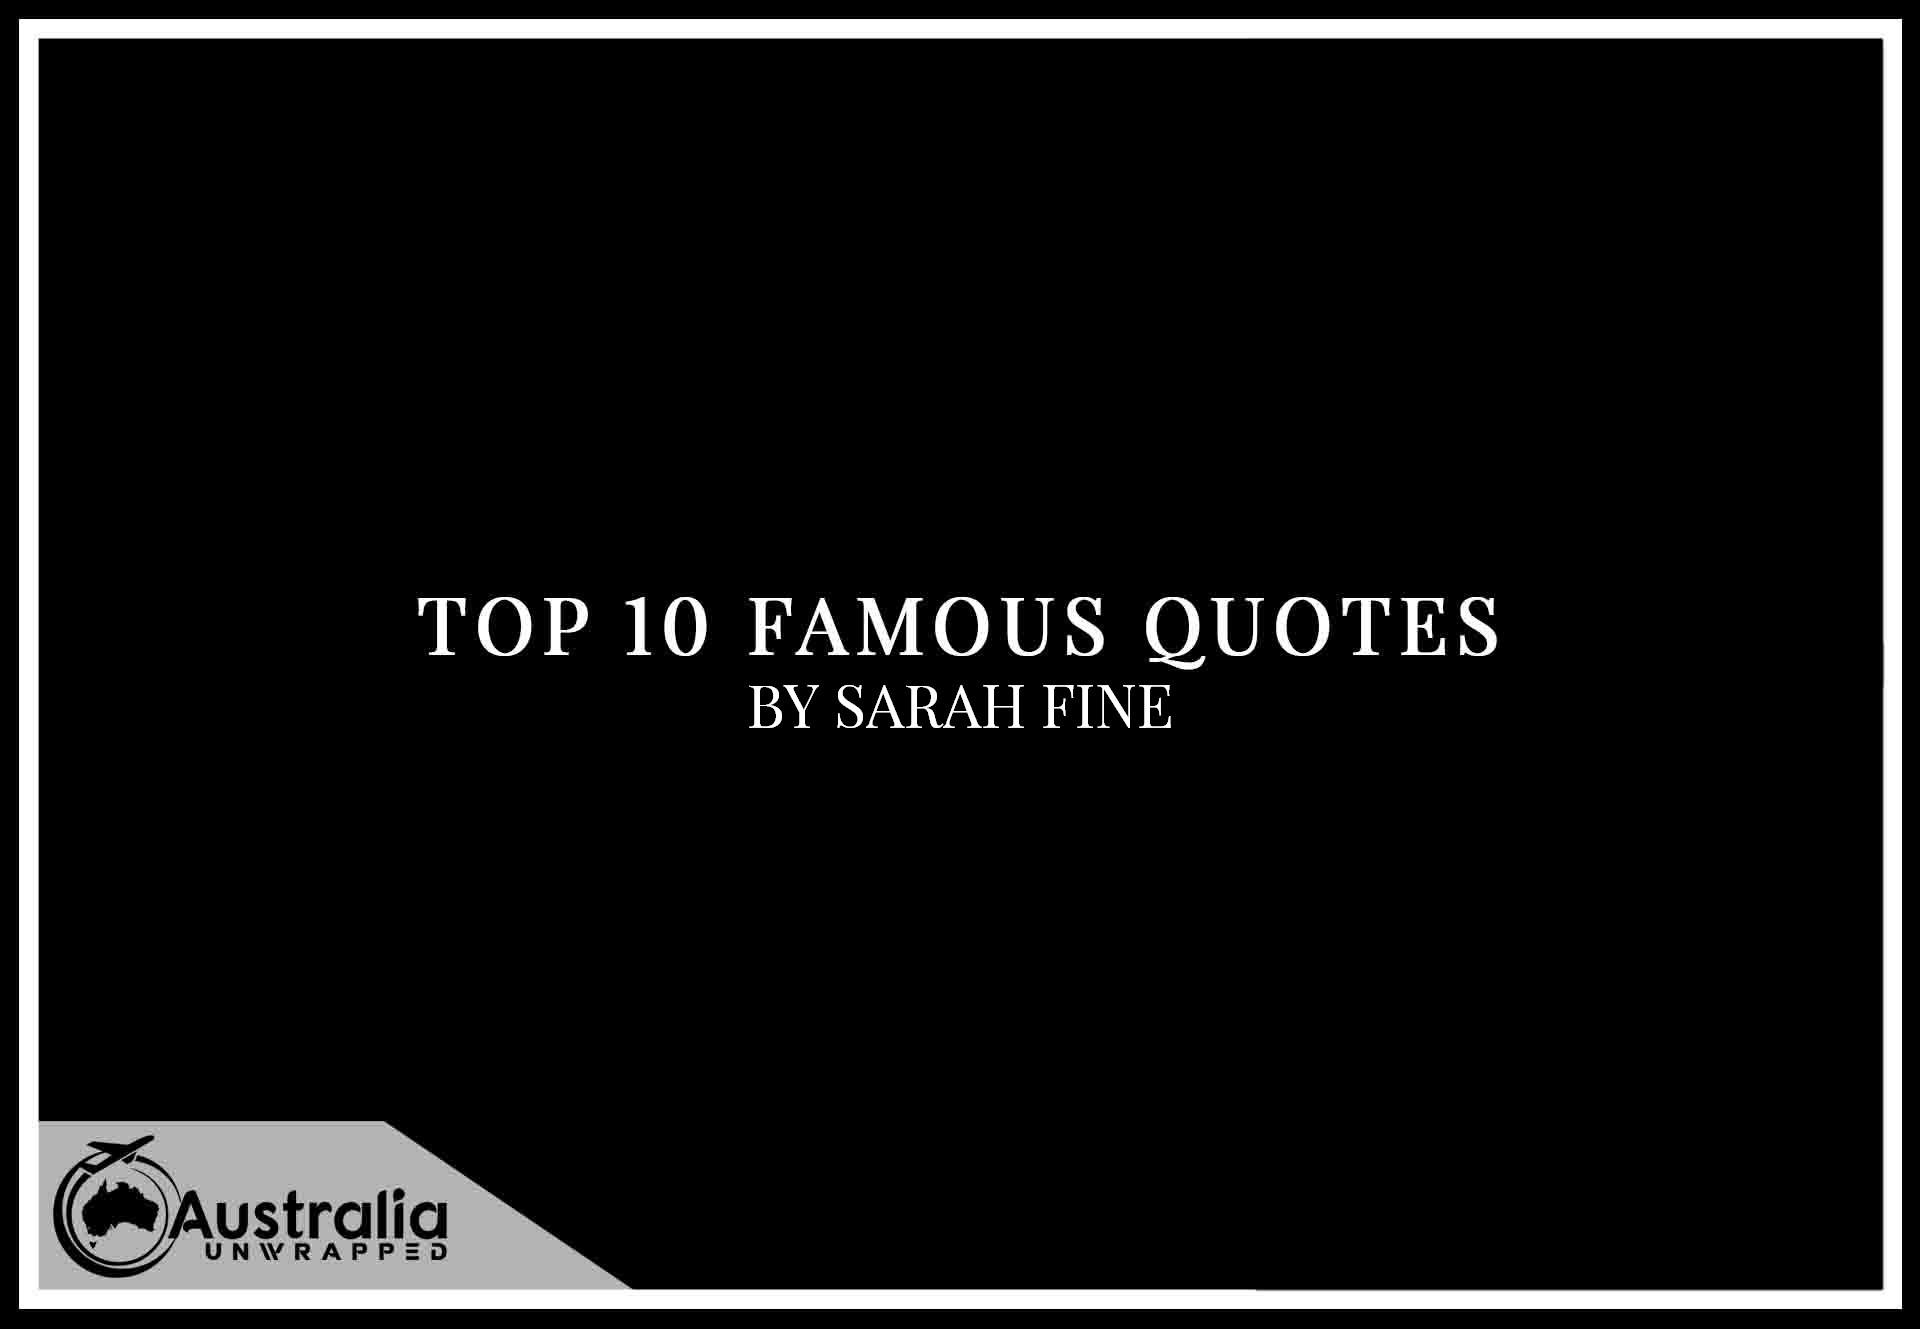 Top 10 Famous Quotes by Author Sarah Fine